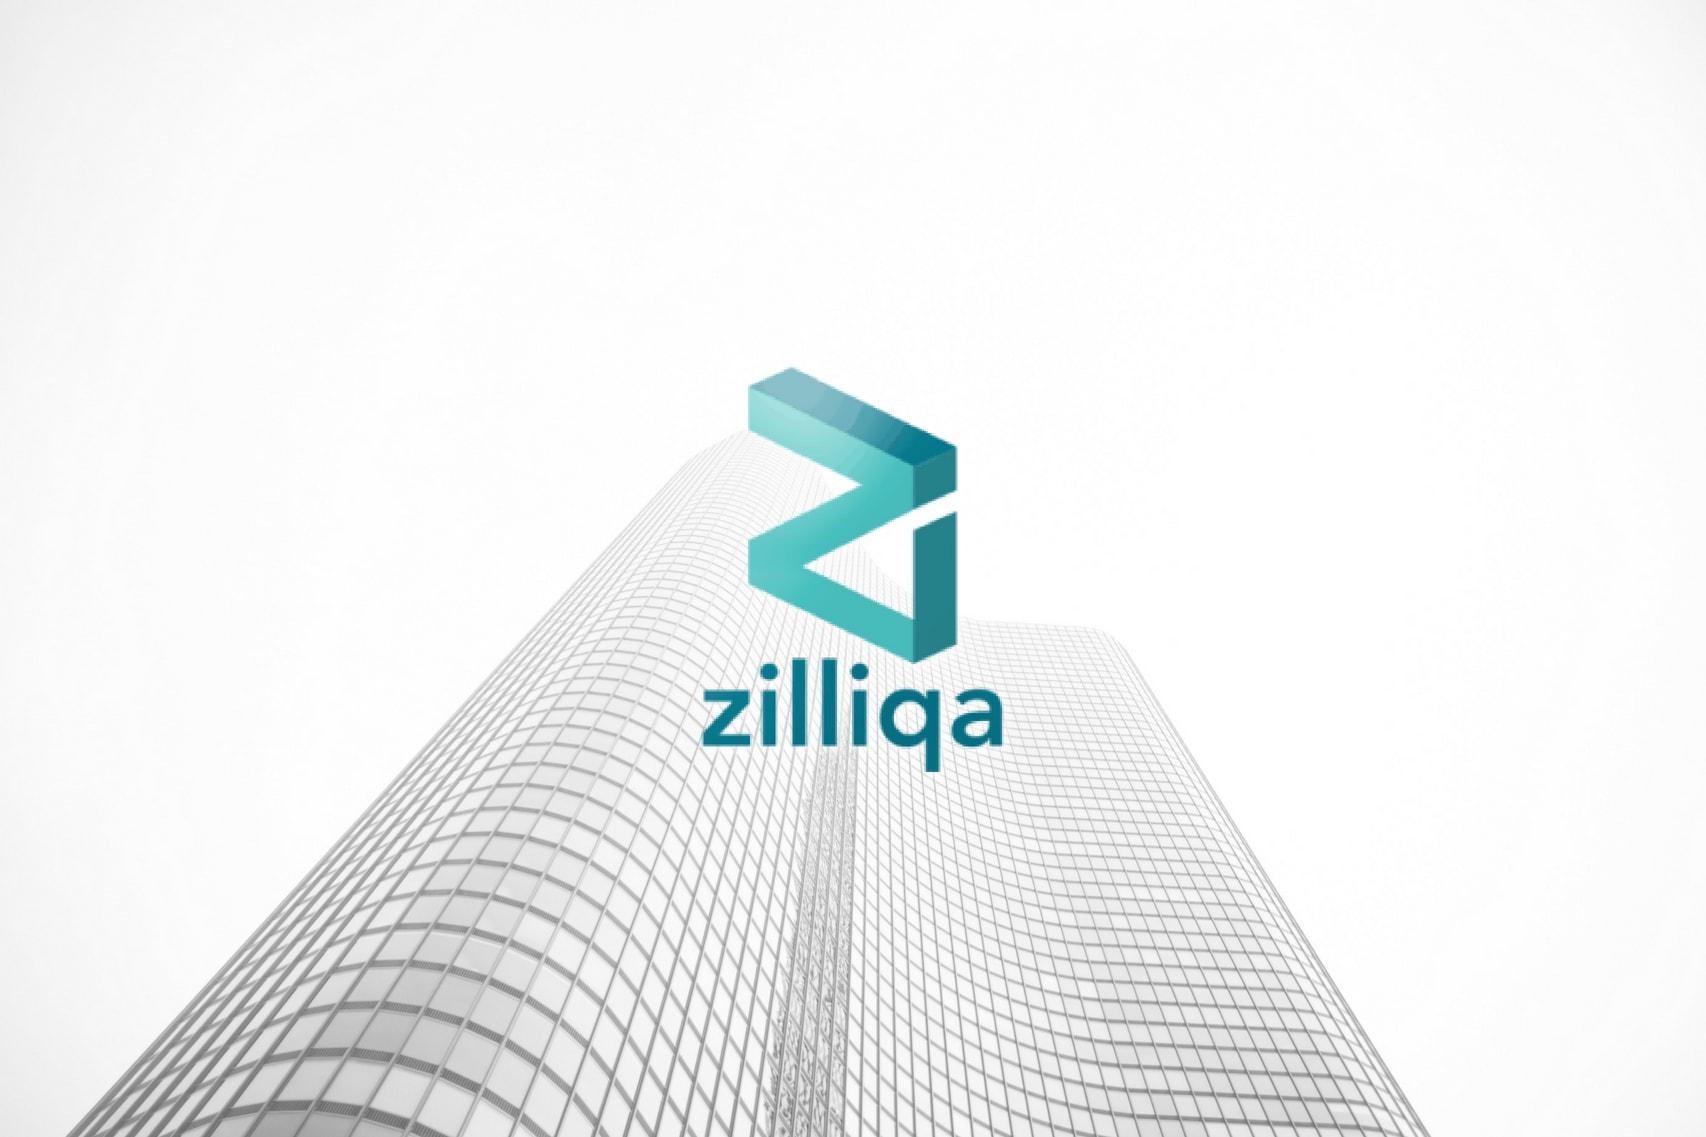 Zilliqa: de snelste blockchain tot nu toe